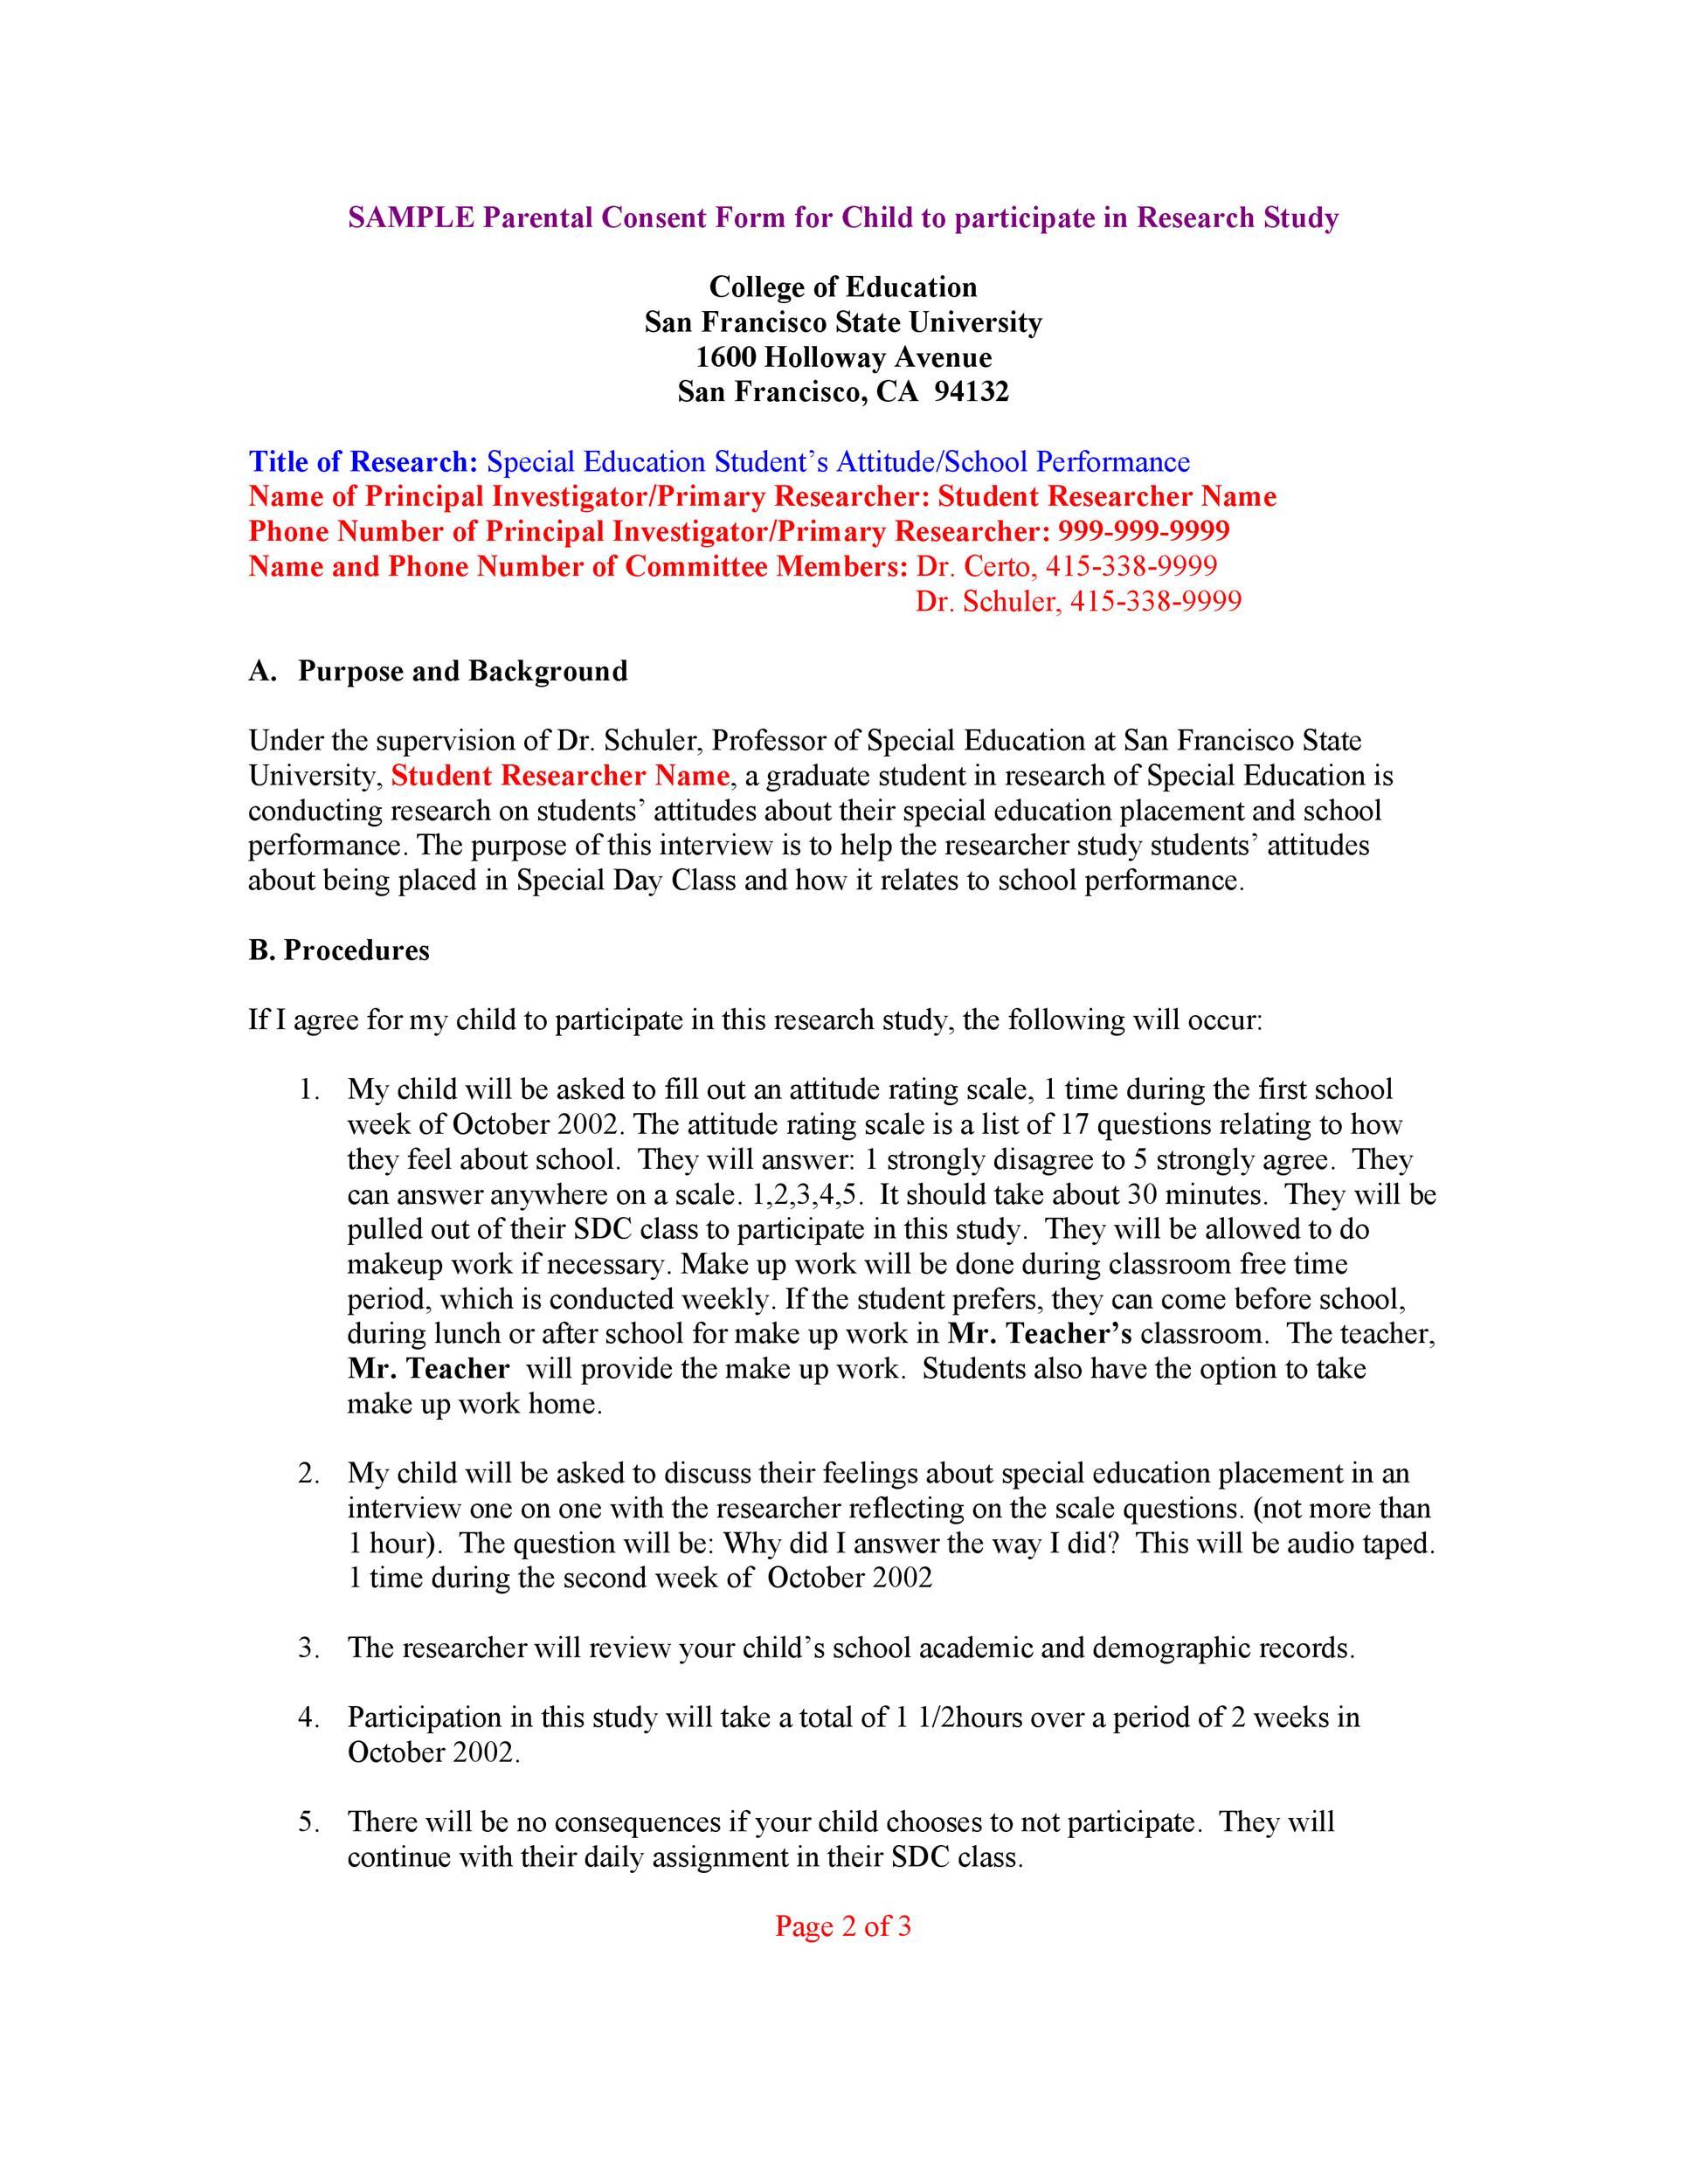 50 Printable Parental Consent Form  Templates ᐅ Template Lab